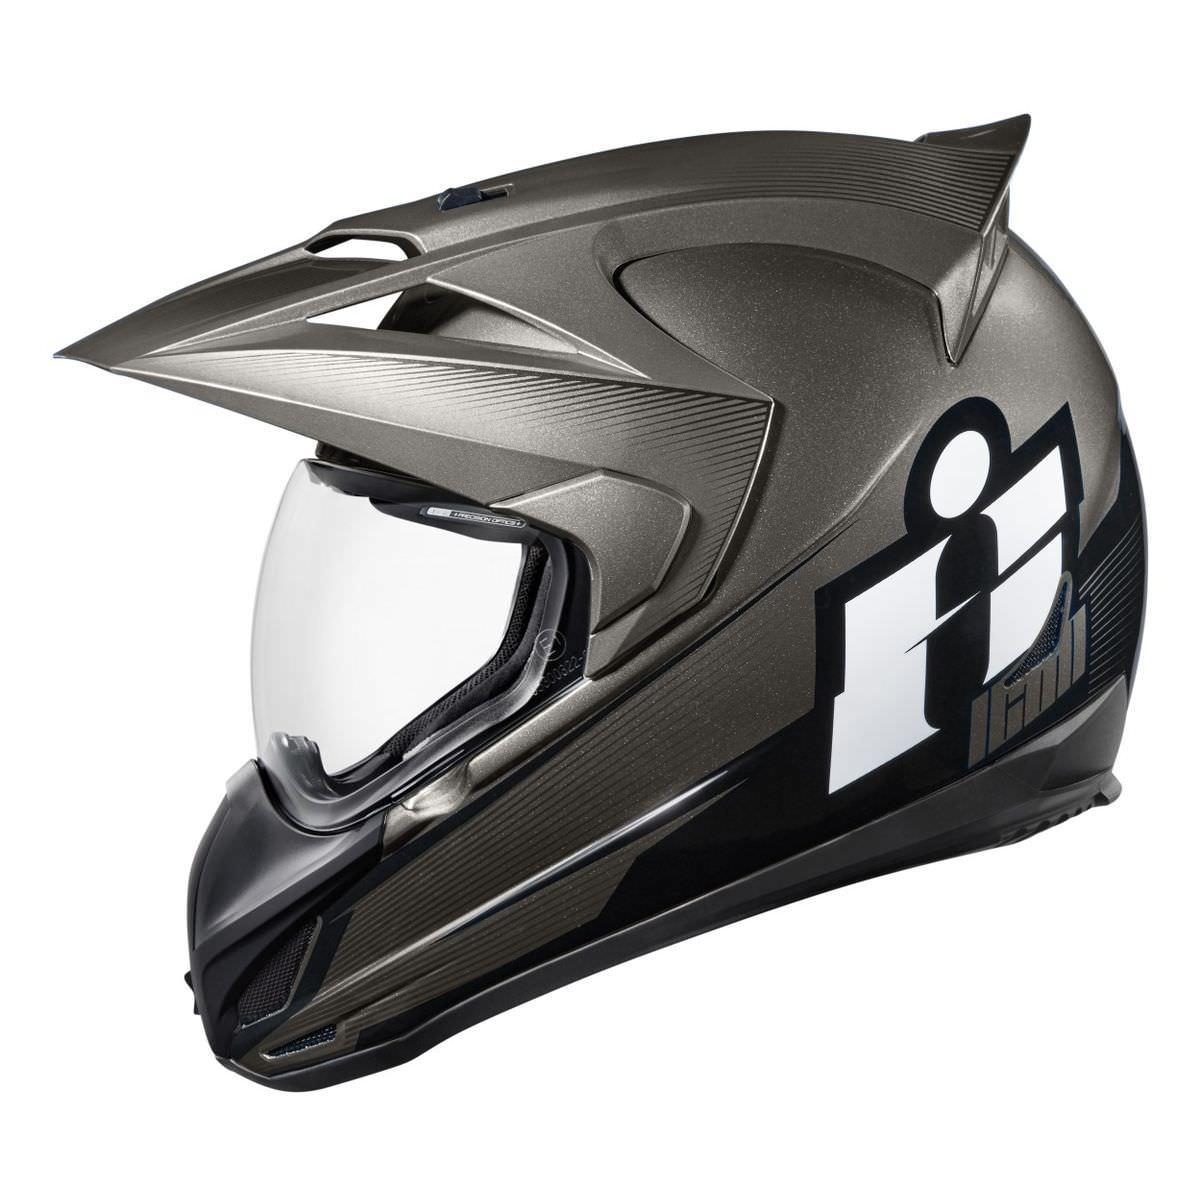 Icon Variant Double Stack Helmet 1 - Icon Variant Double Stack Helmet